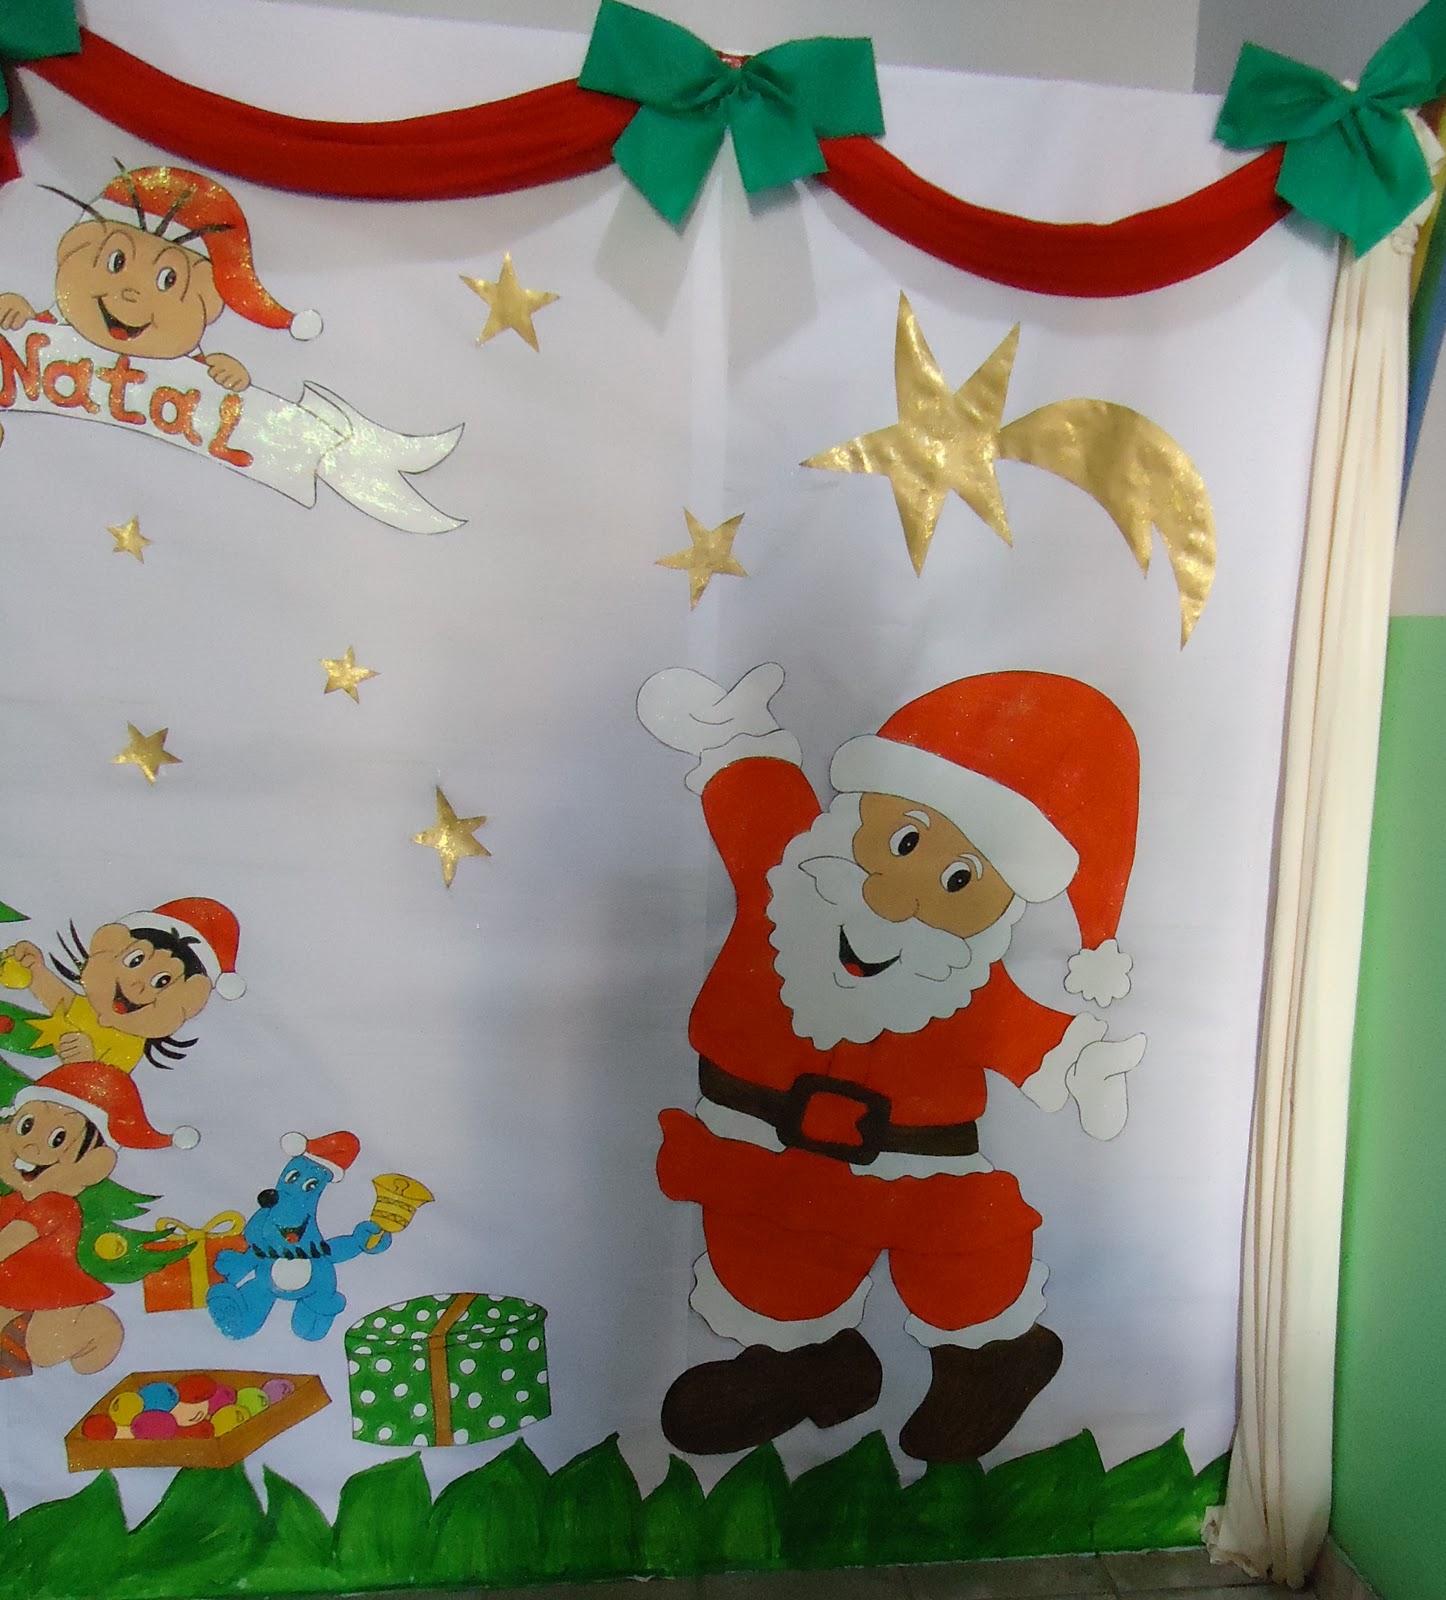 Wcb criatividades mural de natal for Mural de natal 4 ano